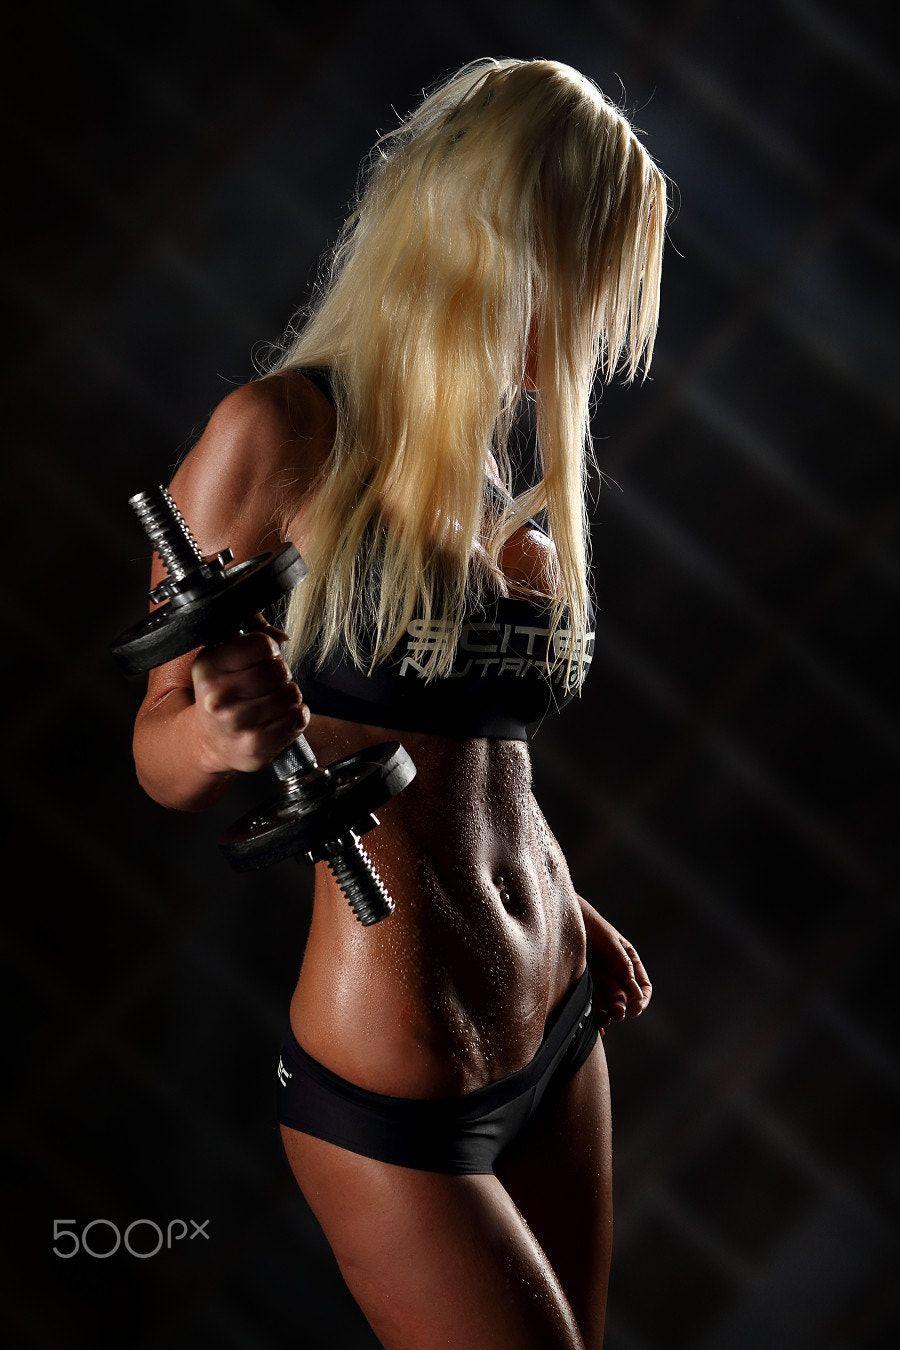 Girls in panties lifting weights Pin On Girls Fashion Photography